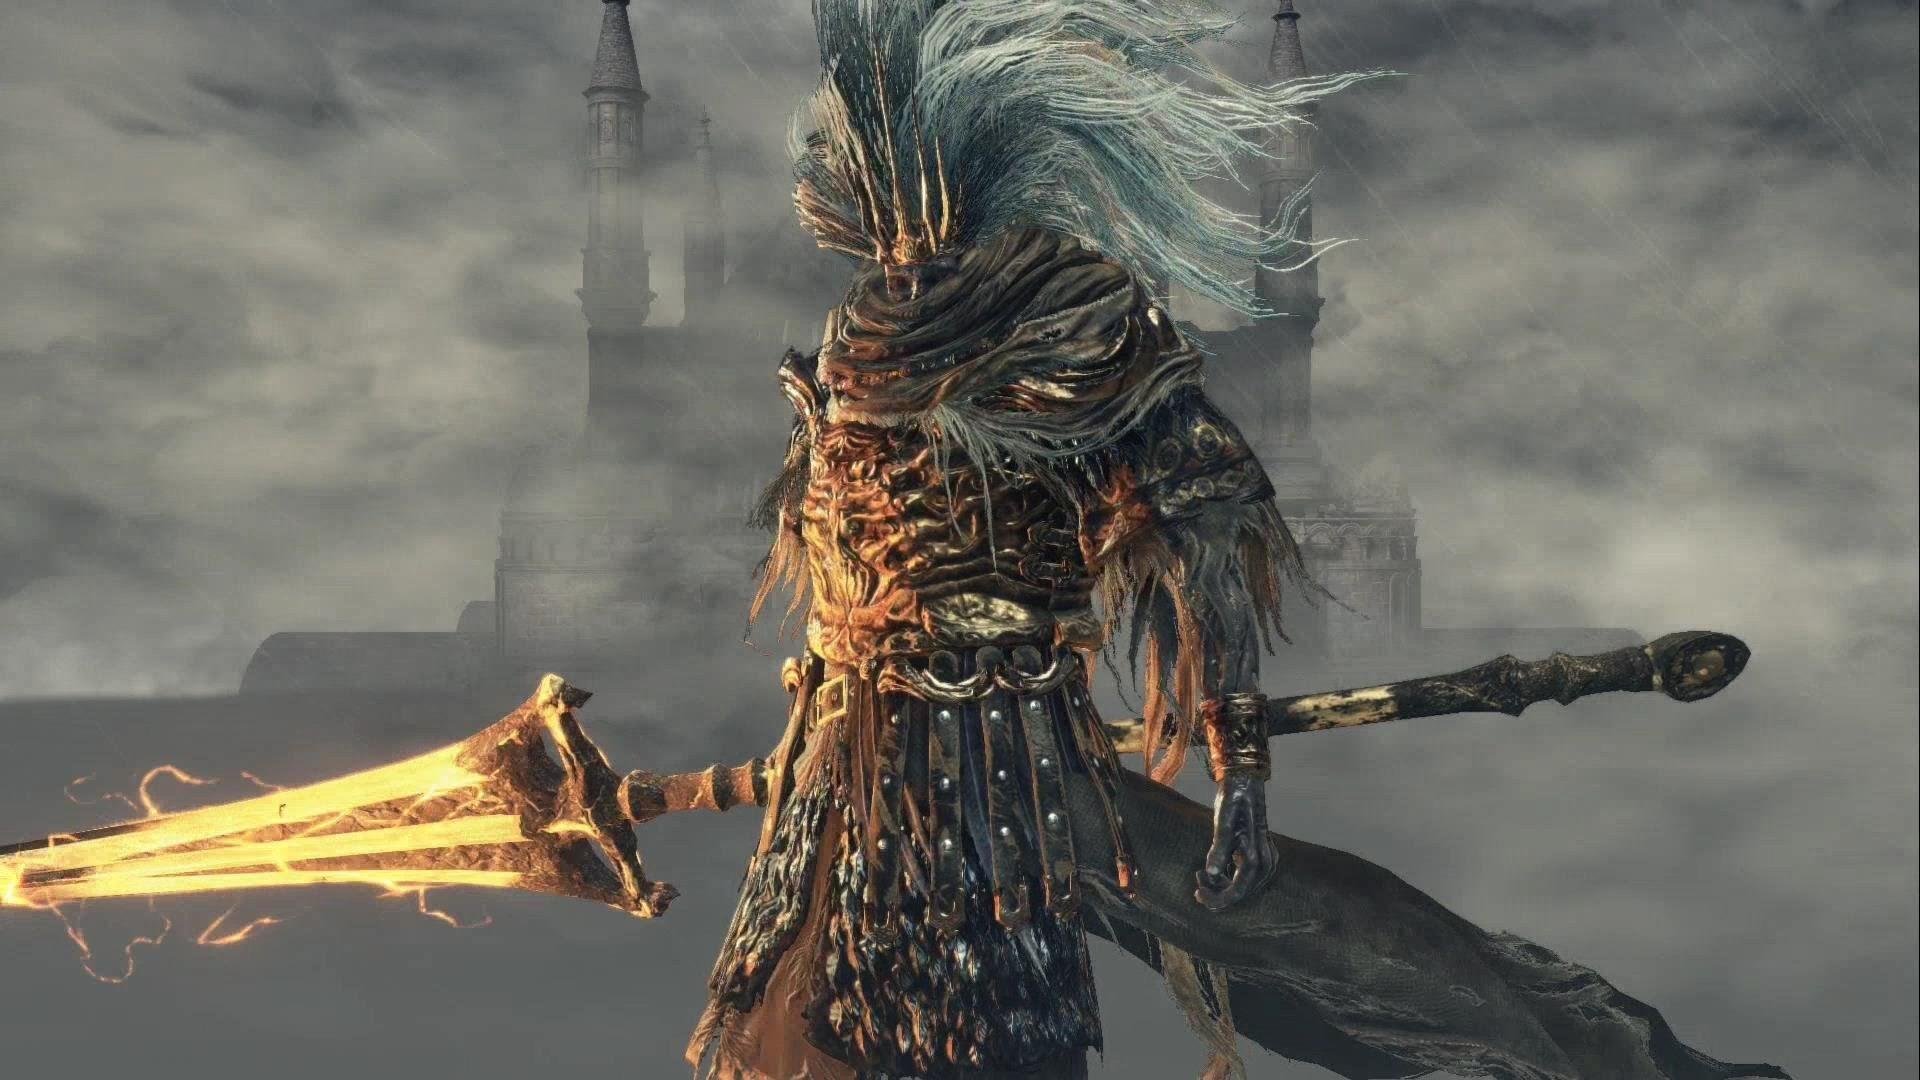 Epic Dark Souls Solaire statue will help you praise the sun – Dark Souls III